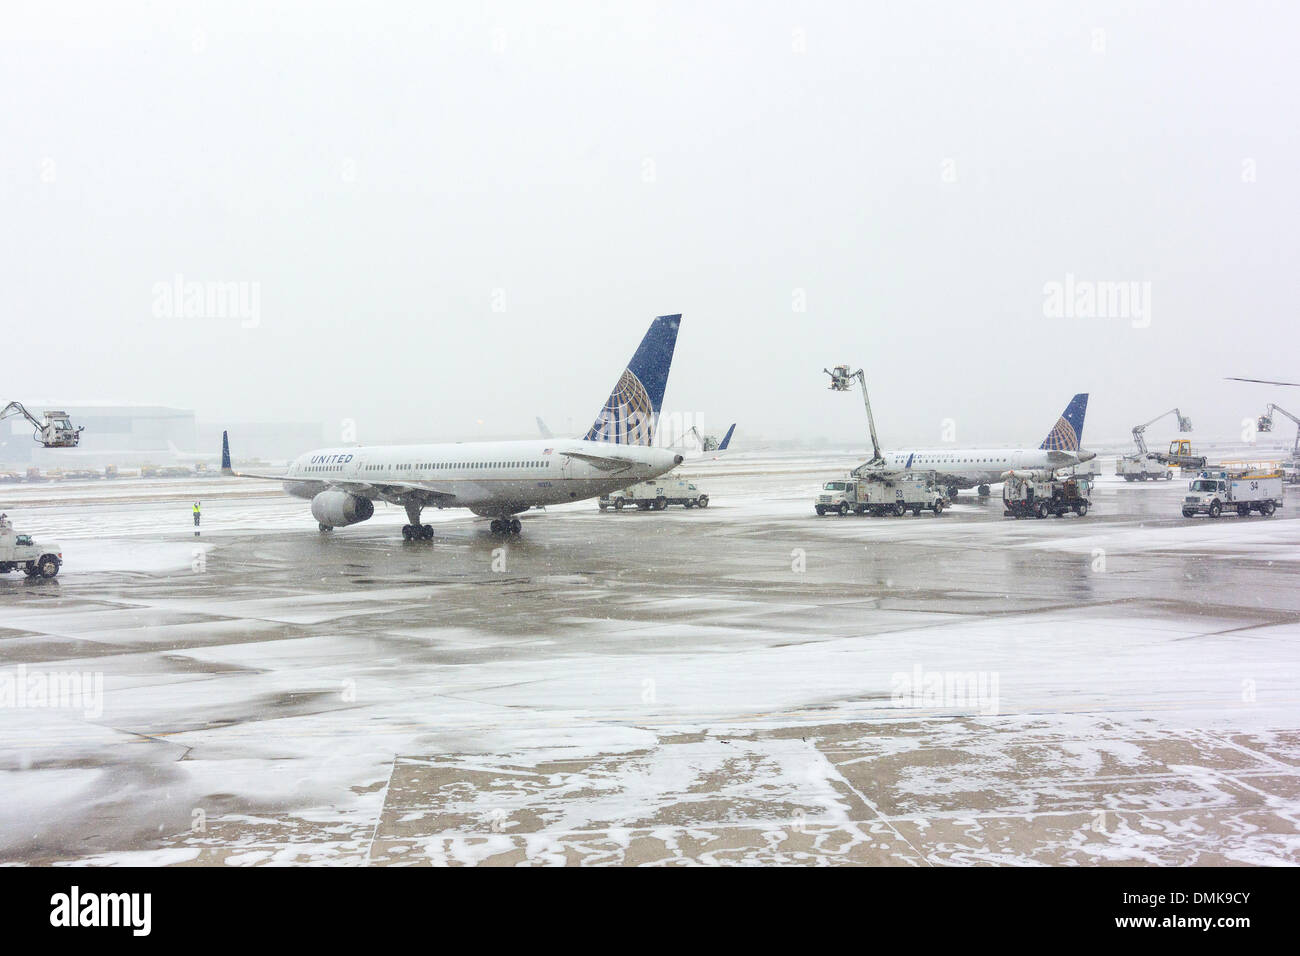 Aeroporto Ewr : Aviões a ser congelado no ewr aeroporto internacional newark